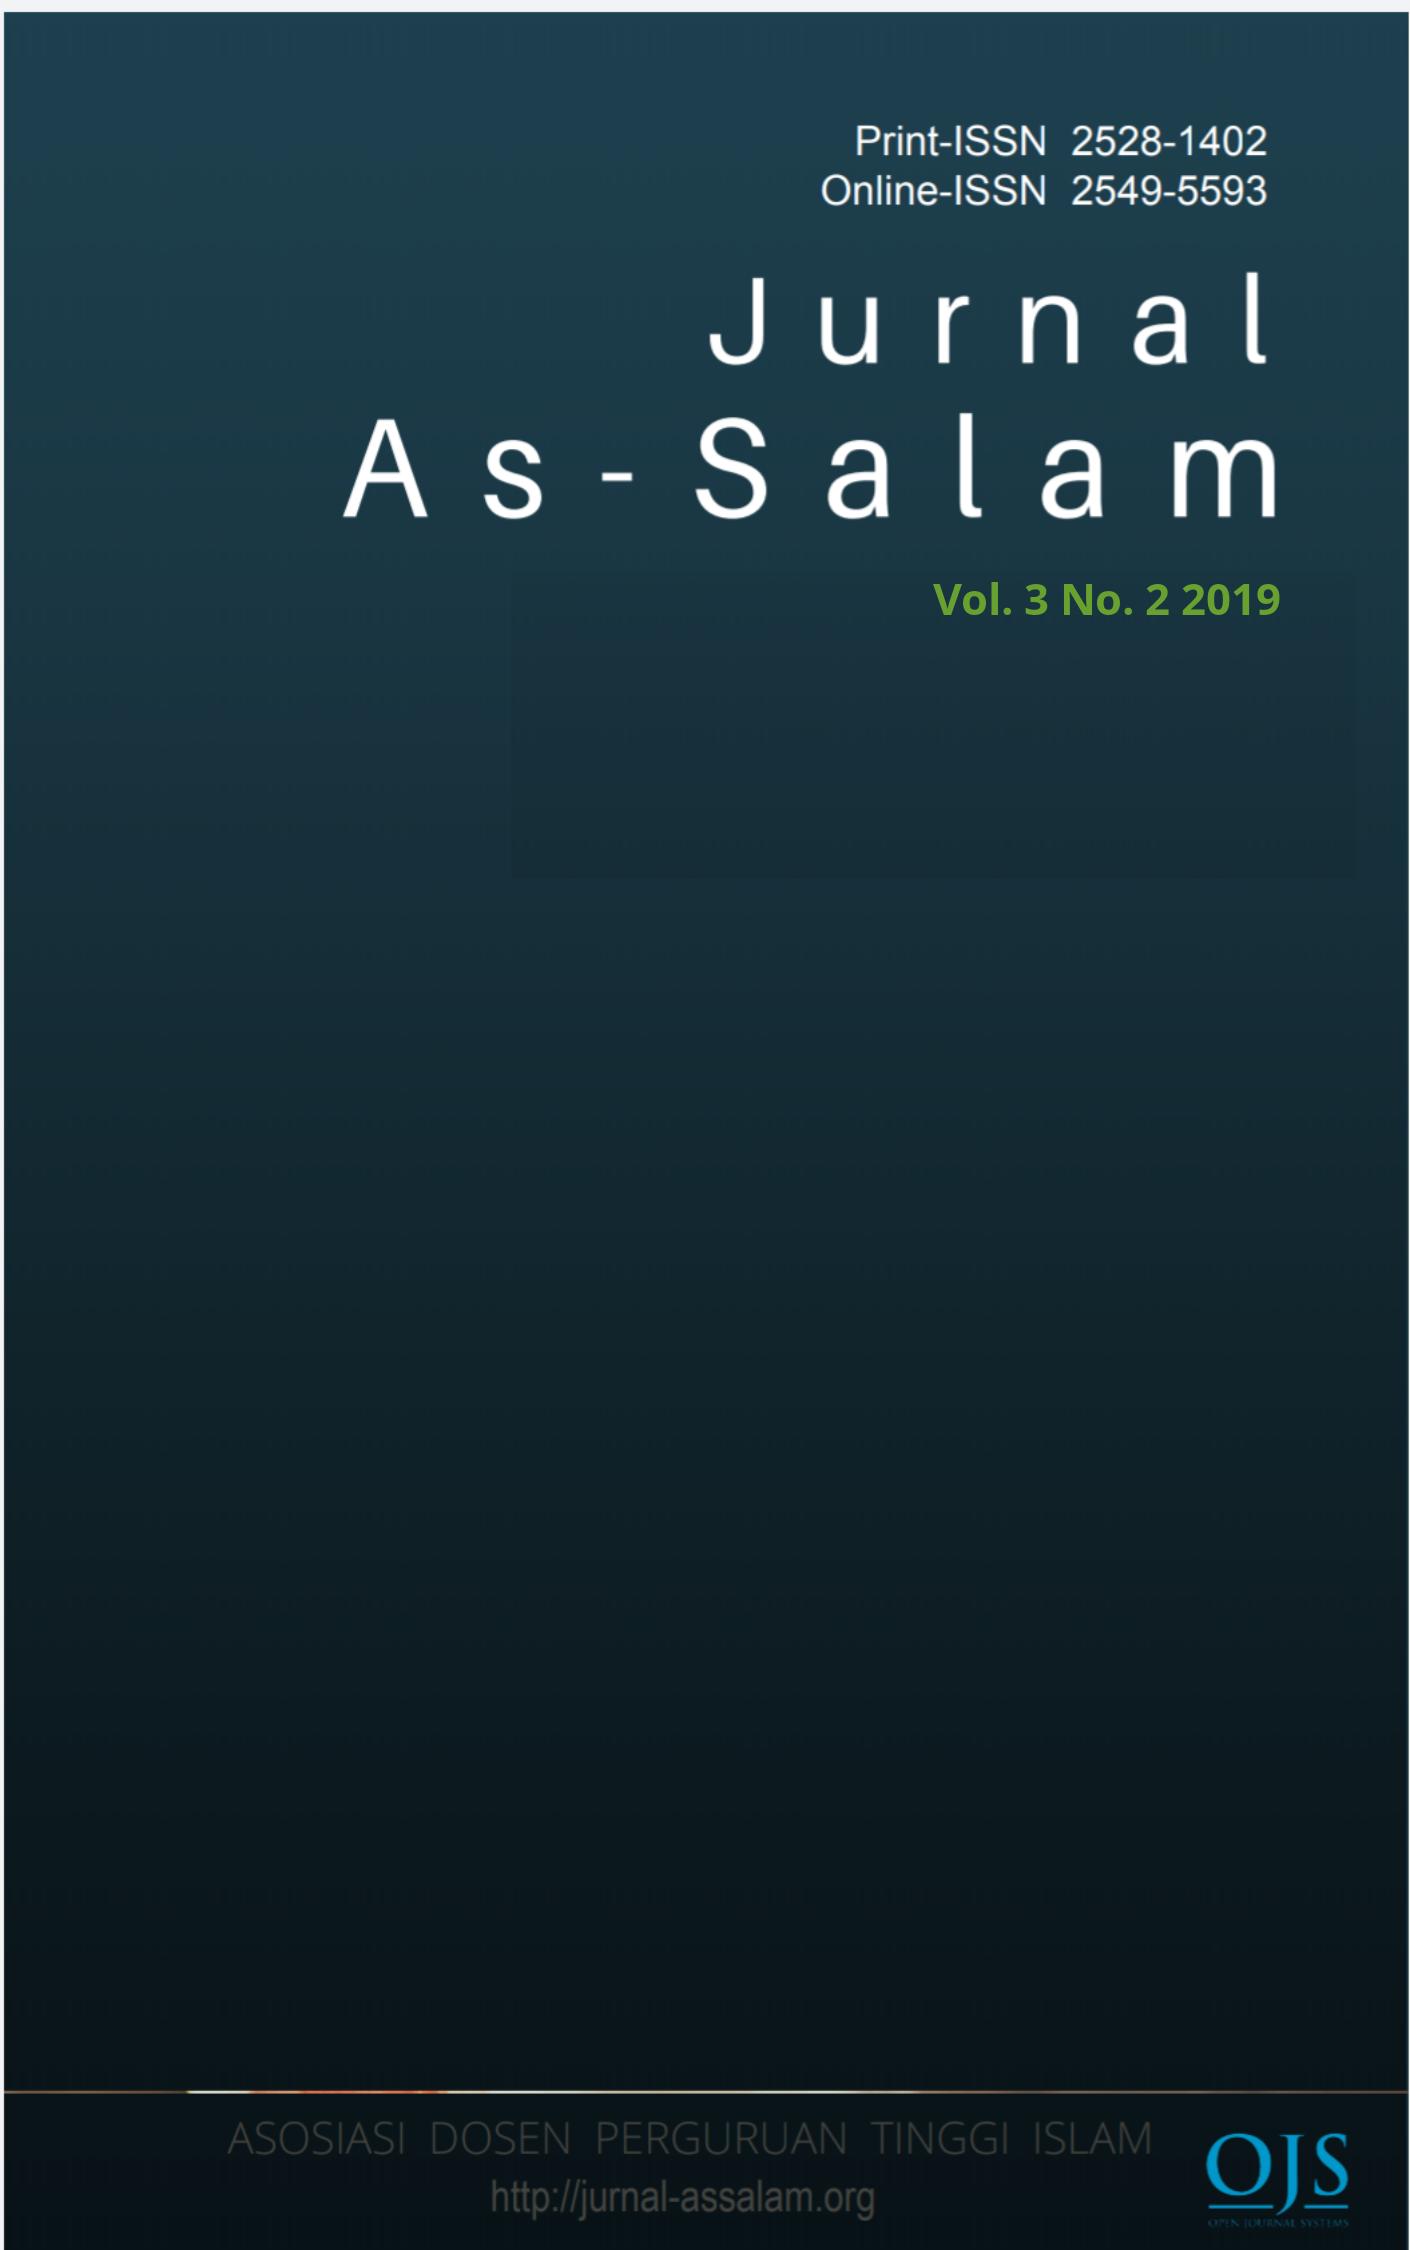 View Vol. 3 No. 2 (2019): Jurnal As-Salam